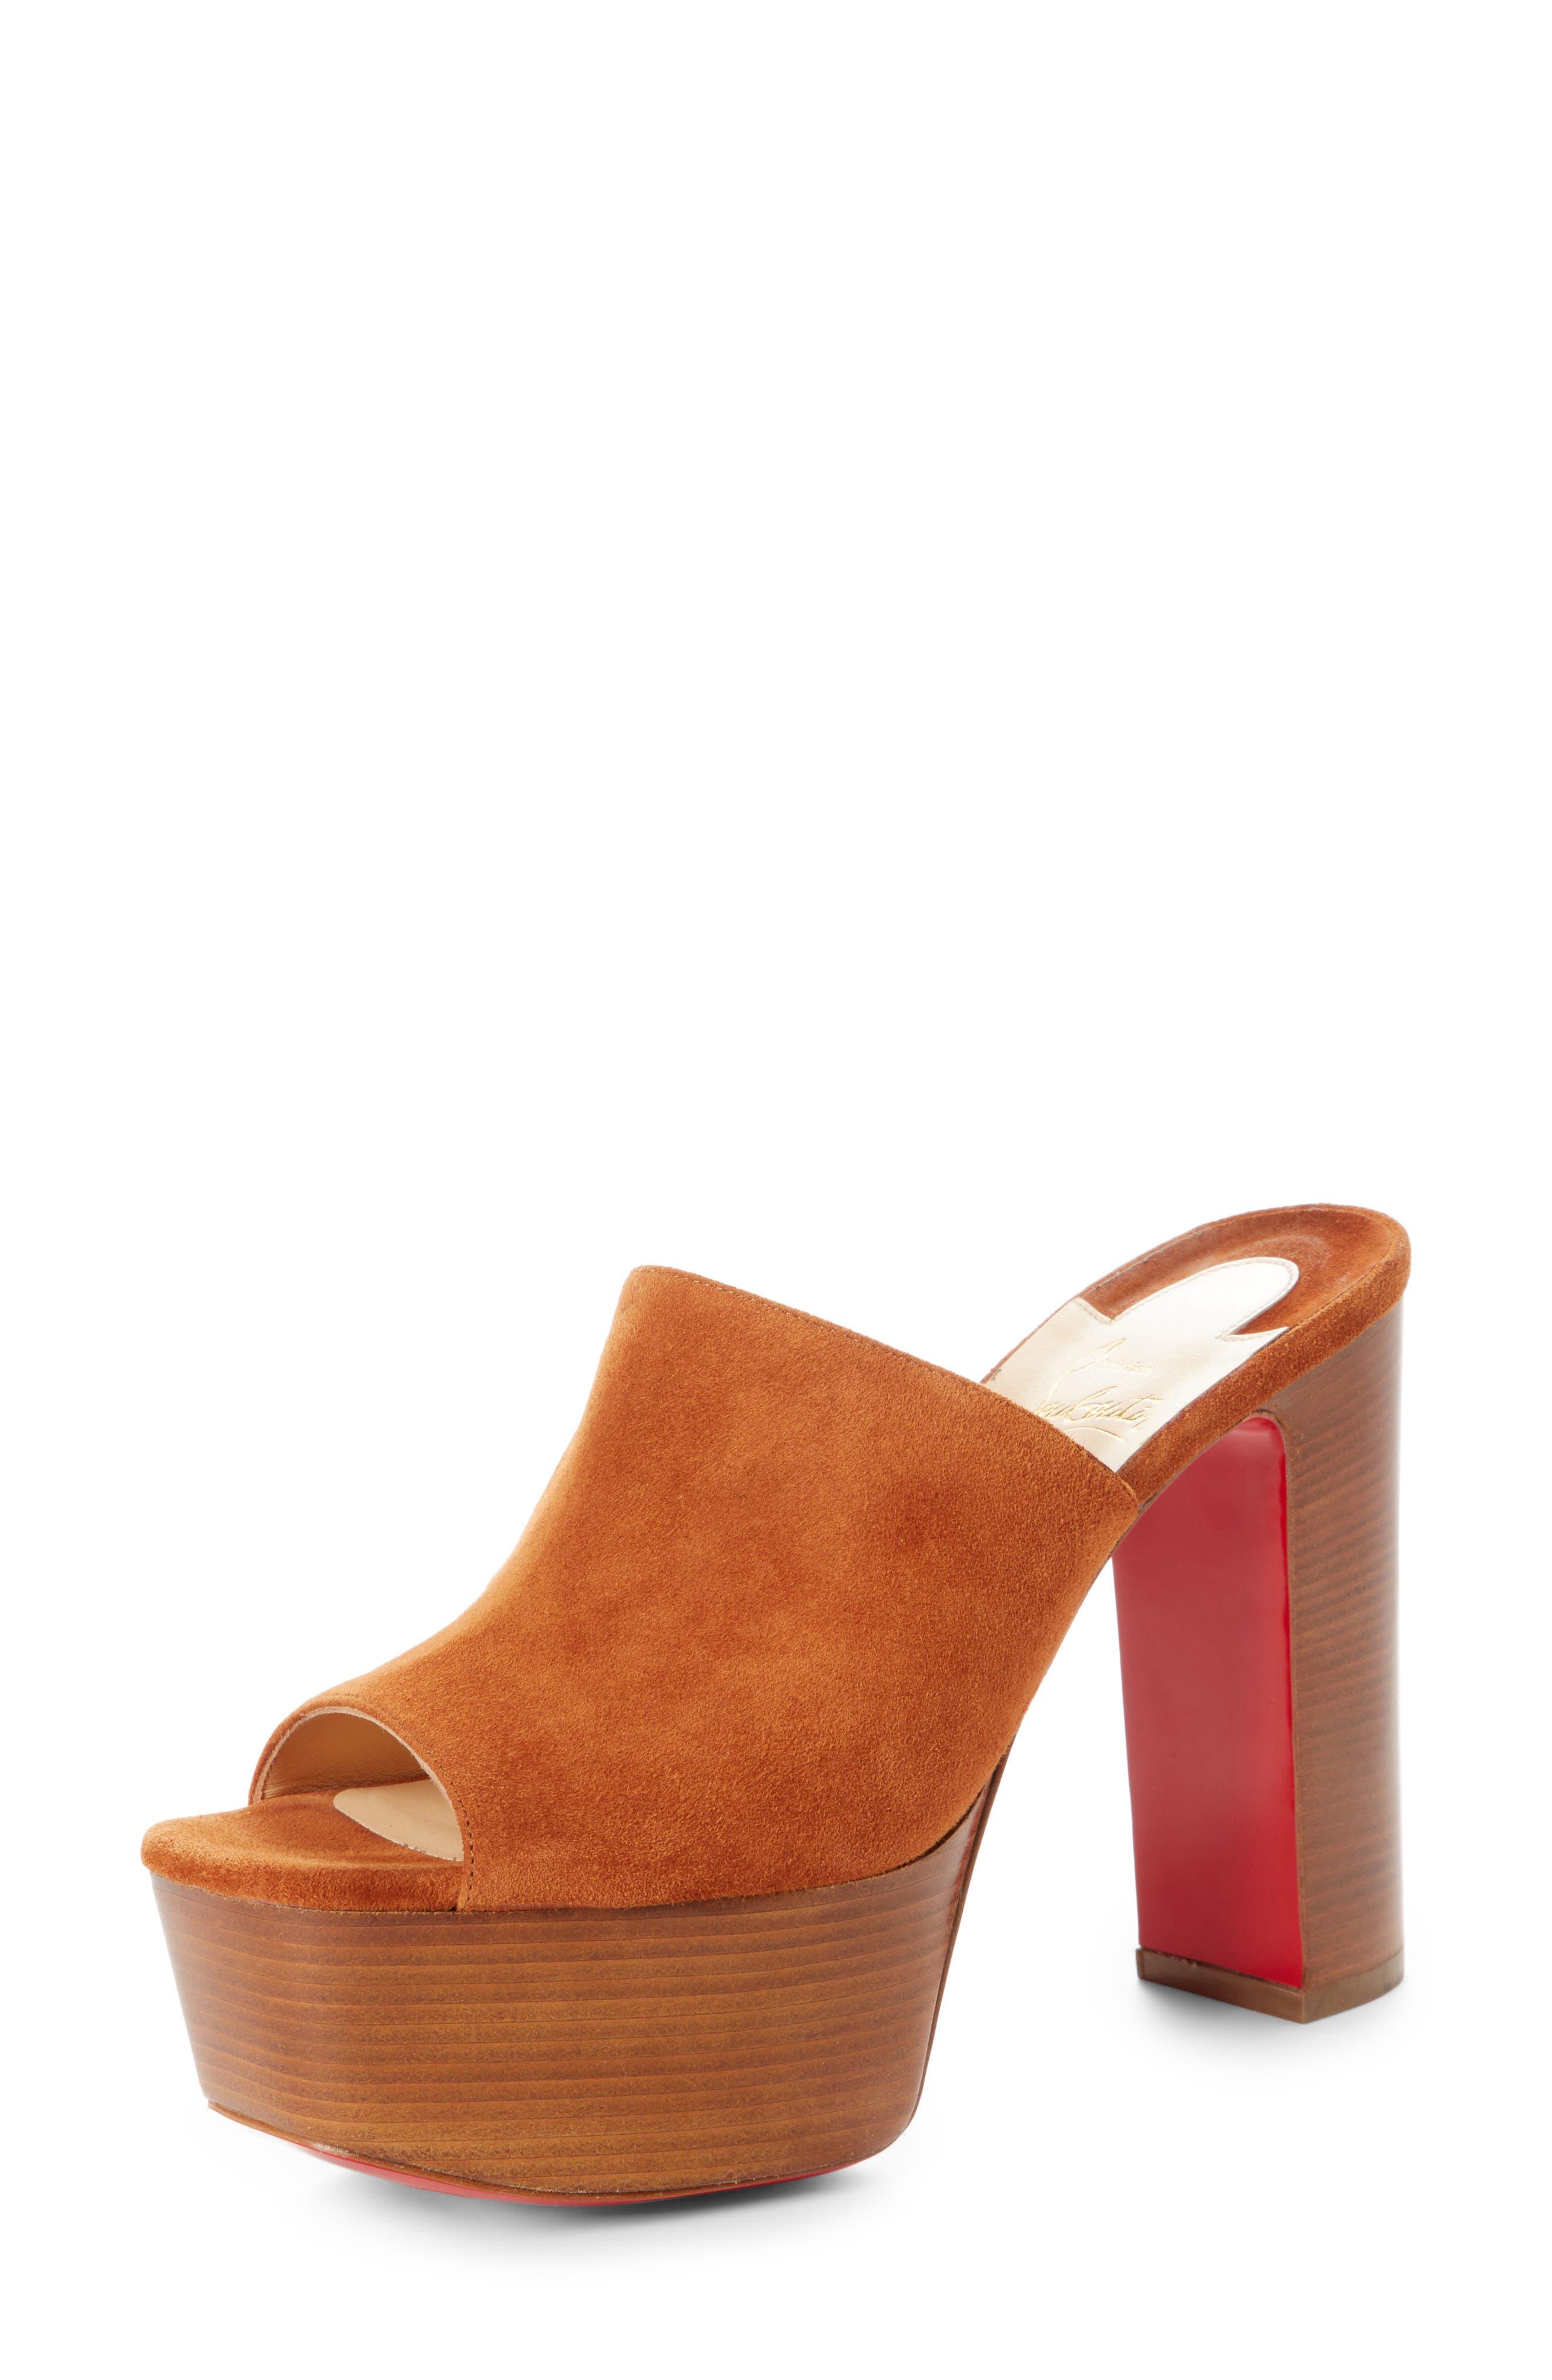 Alternate Image 1 Selected - Christian Louboutin Suede Platform Mule Sandal (Women)